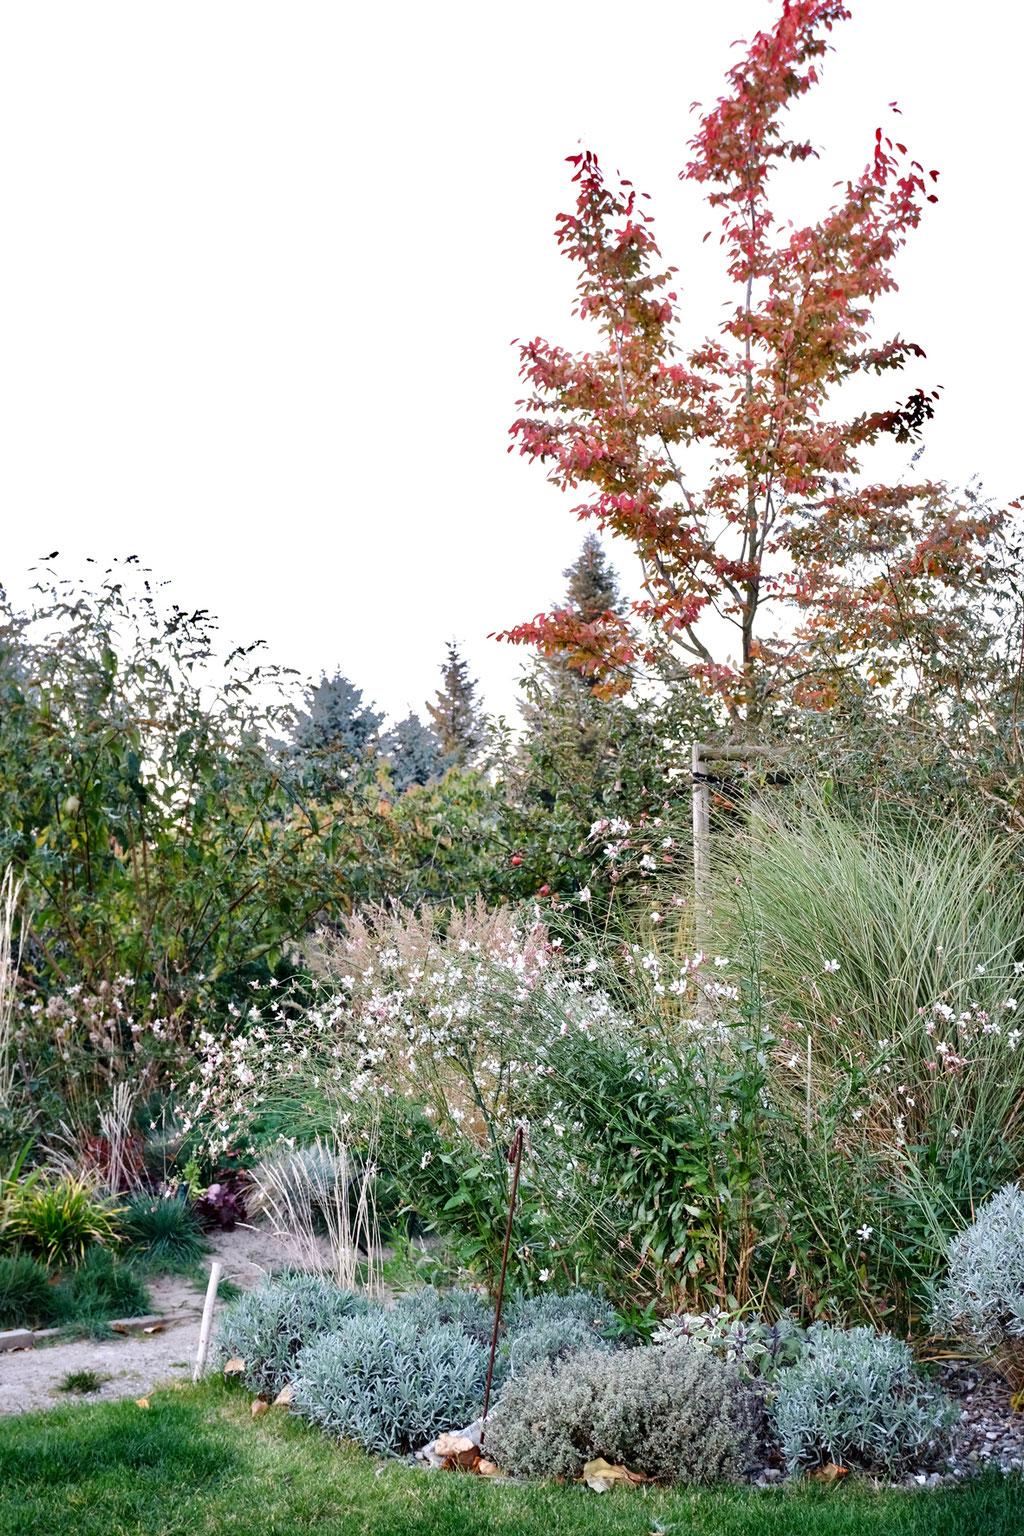 dieartigeGARTEN - Oktobergarten | Felsenbirne, Sommerflieder, Prachtkerze, Gräser, Lavendel, Thymian